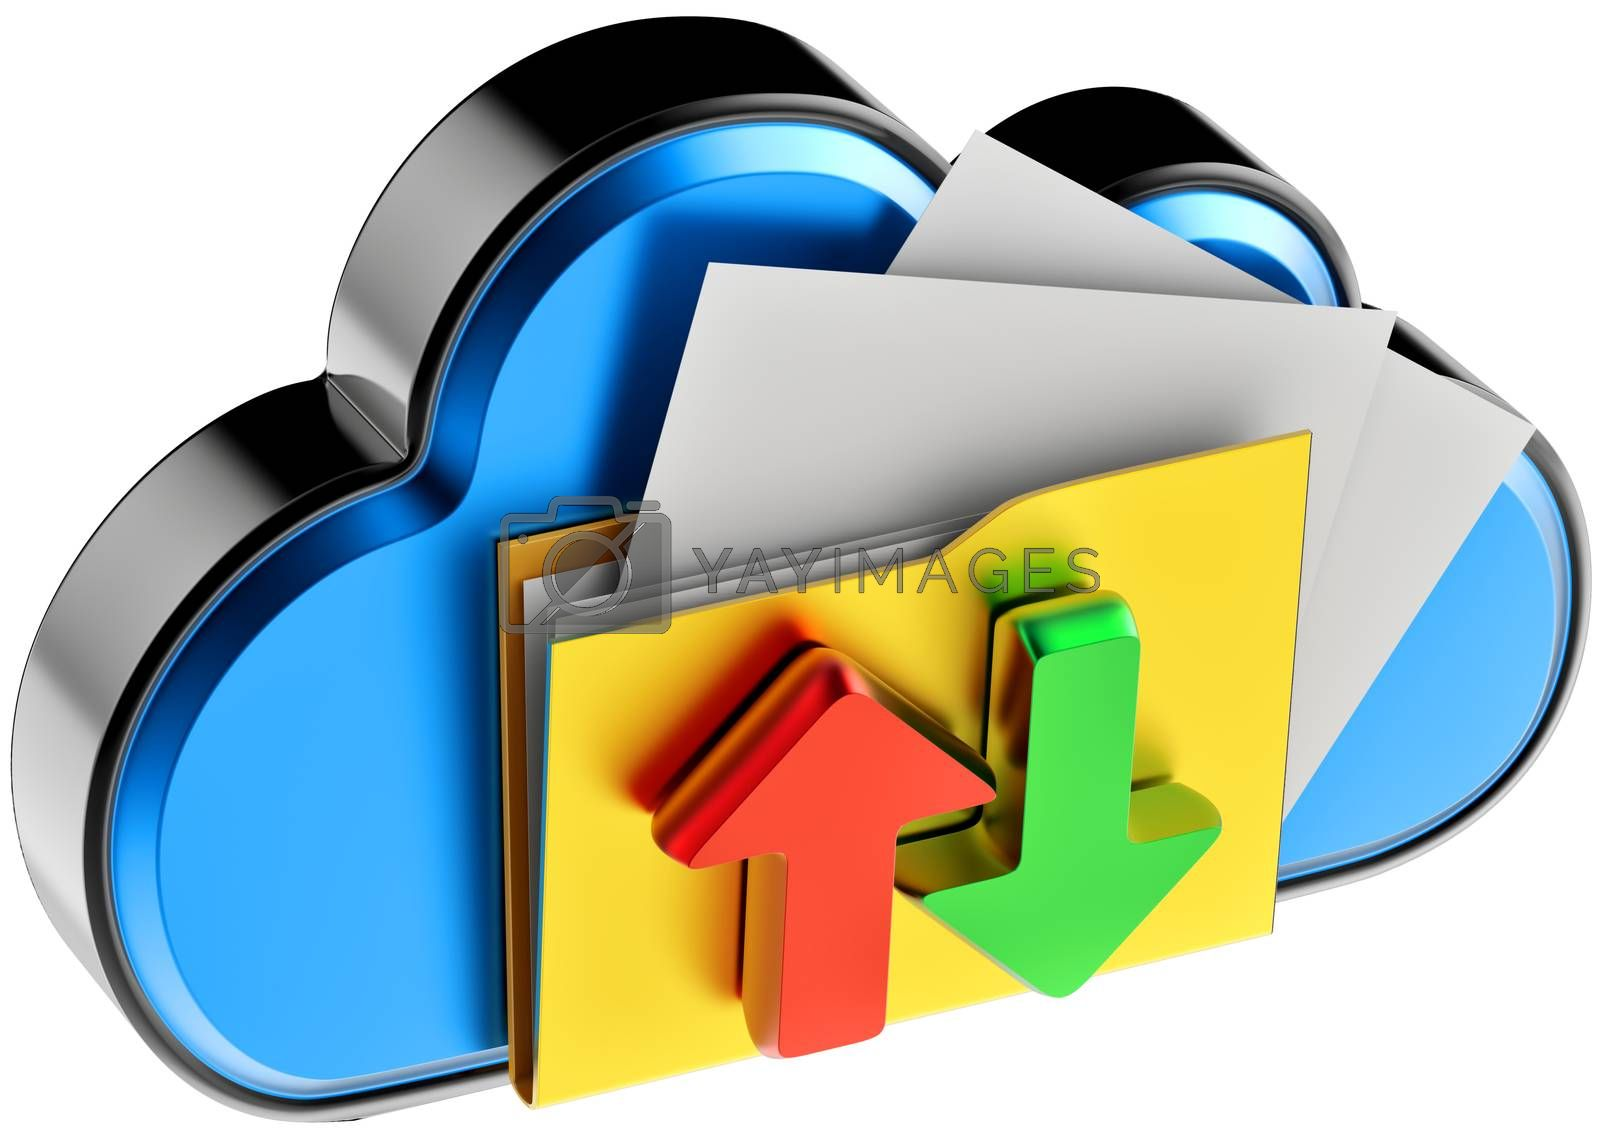 cloud computing and circulation digital documents by merzavka